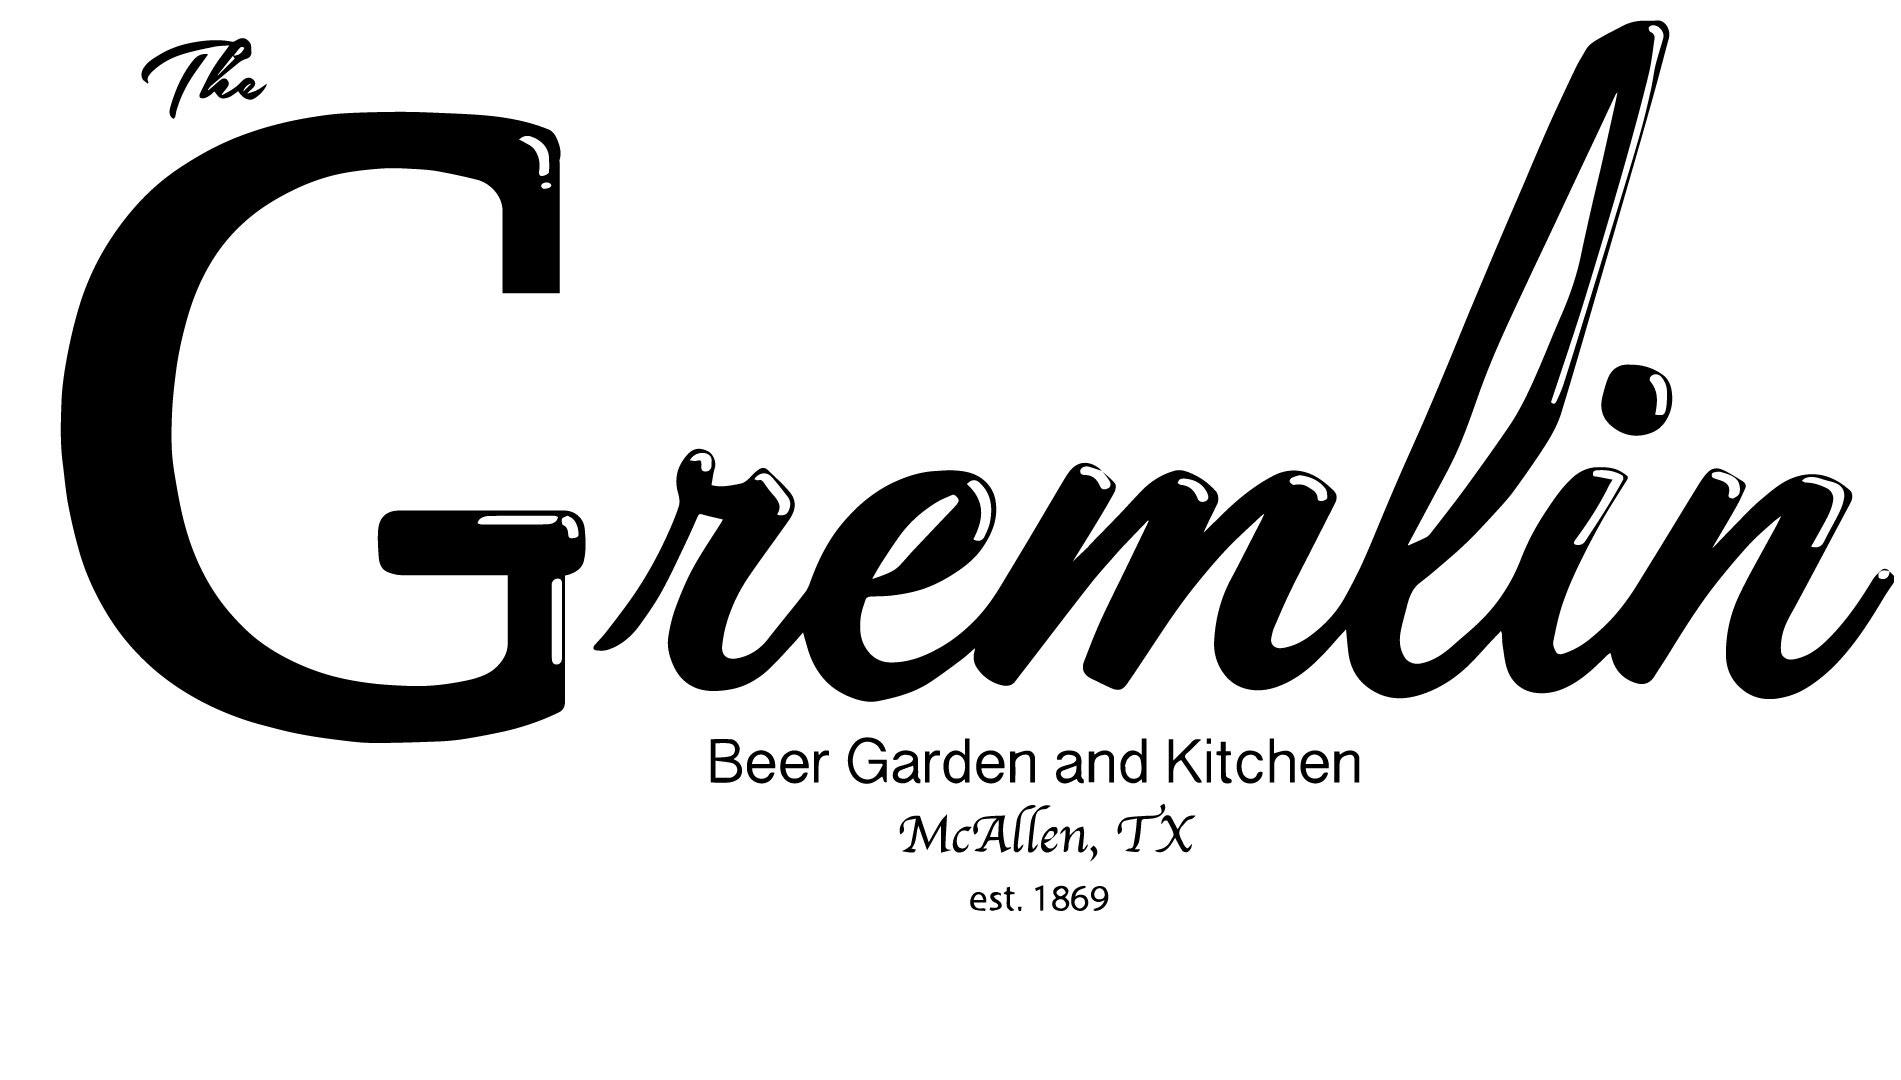 The Gremlin